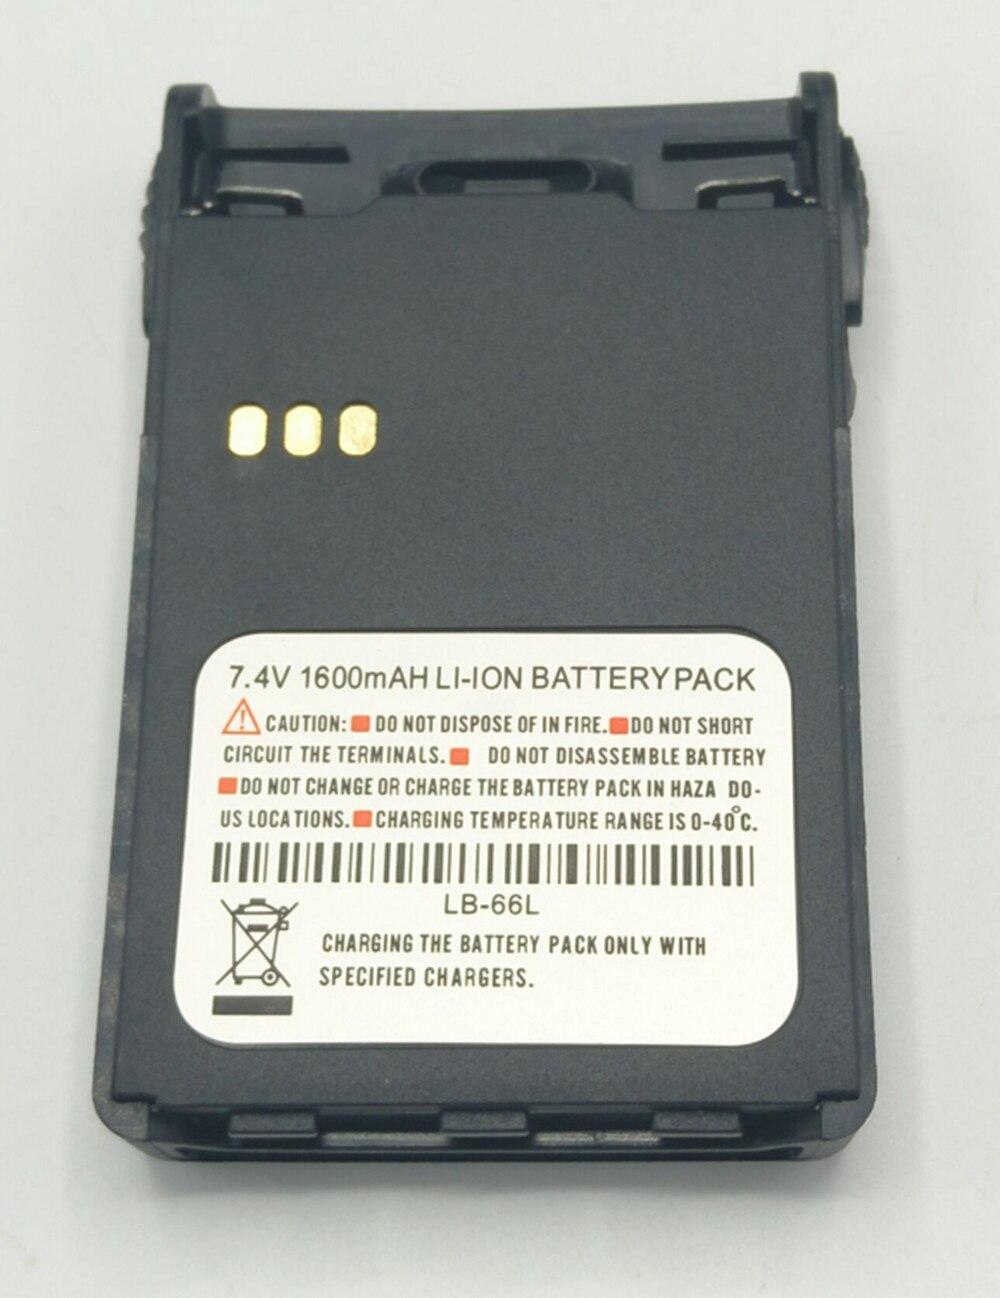 Batterij Pack Case 6x AA Voor Puxing PX777 PX-888K 999/328/728/PX-777PLUS VEV3288S, VEV V1000, VEV V16 etc